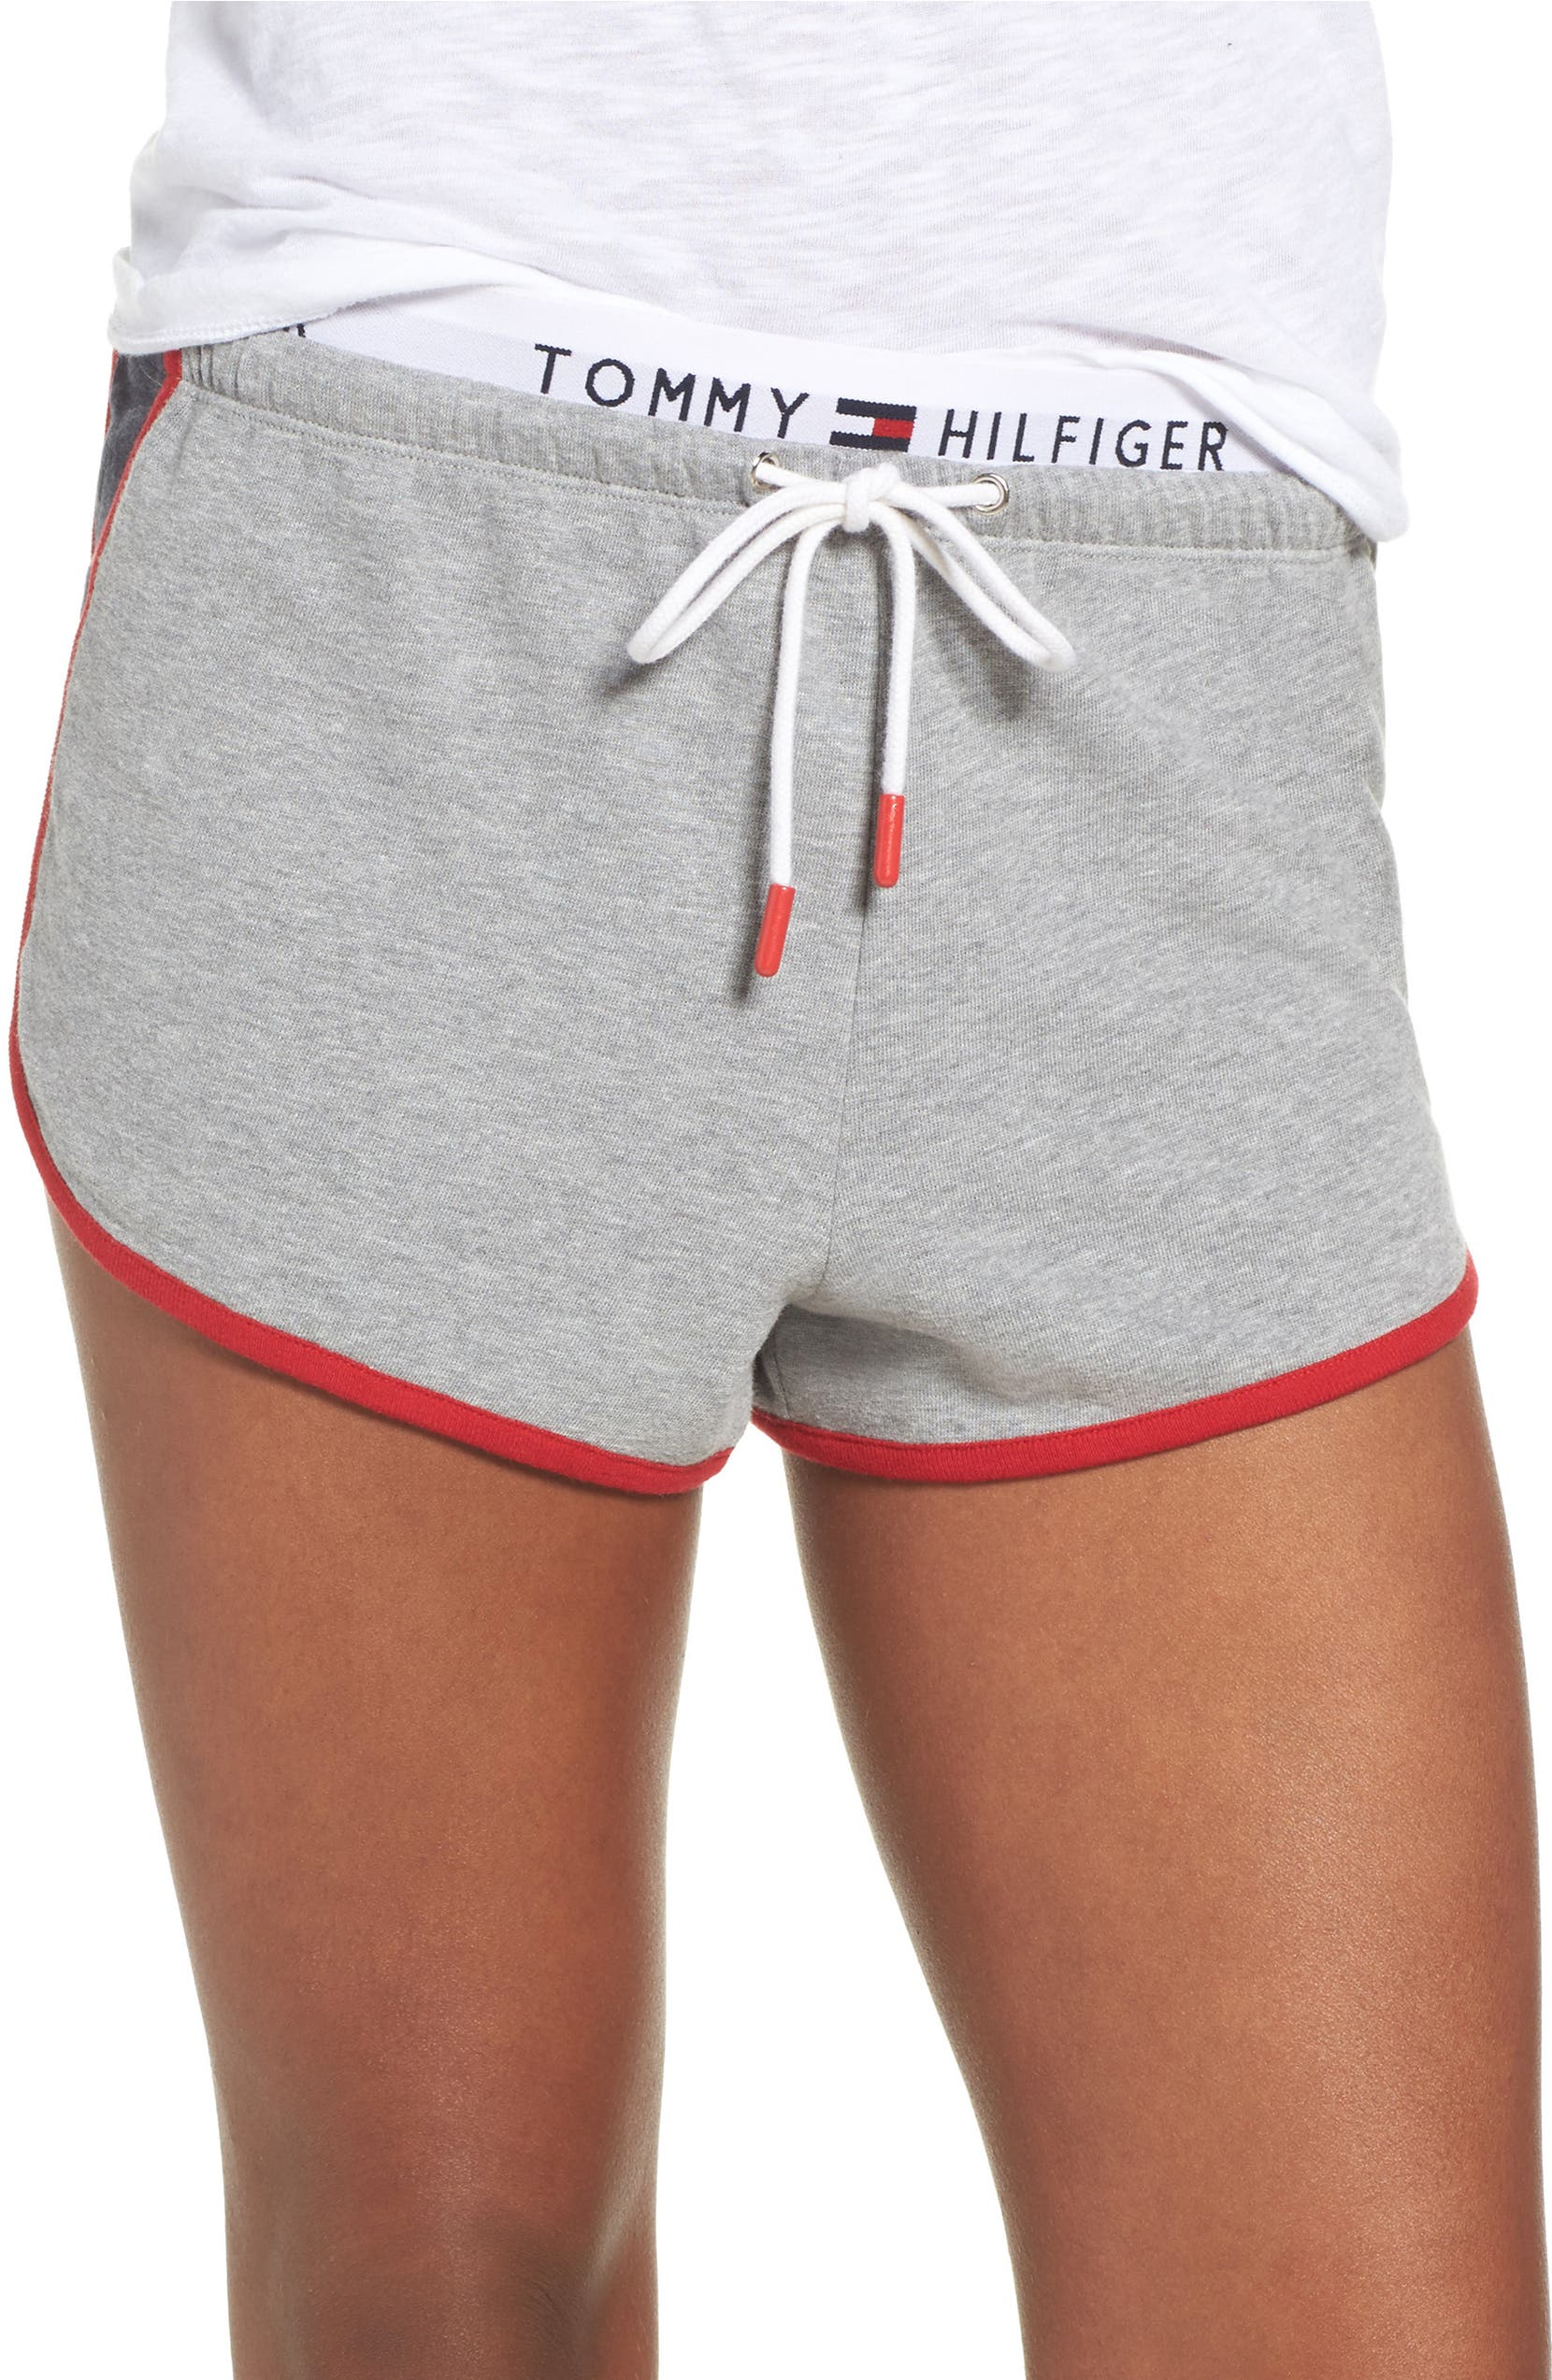 66cee4e81 Tommy Hilfiger TH Retro Shorts